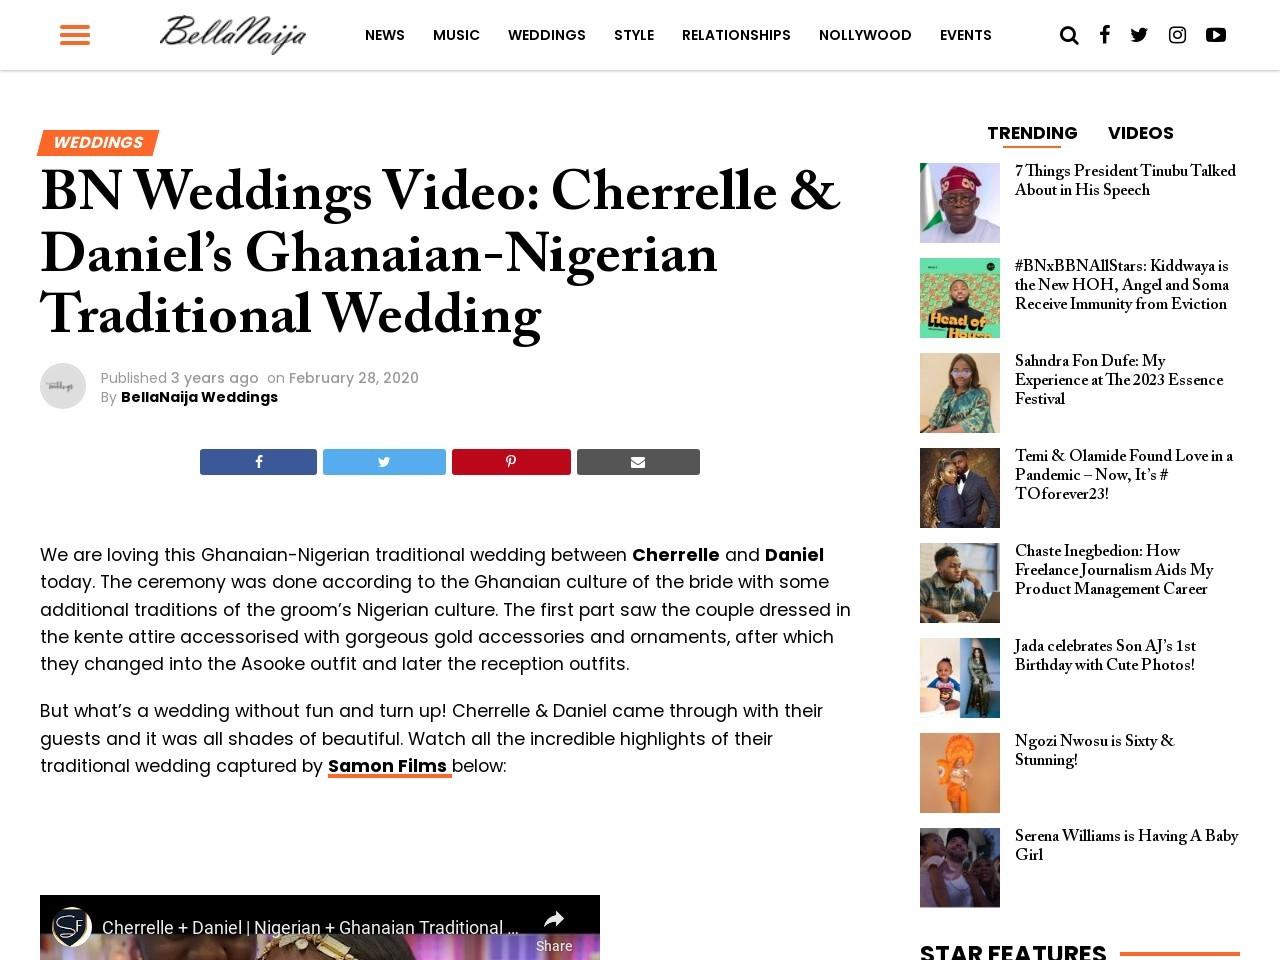 BN Weddings Video: Cherrelle & Daniel's Ghanaian-Nigerian Traditional Wedding